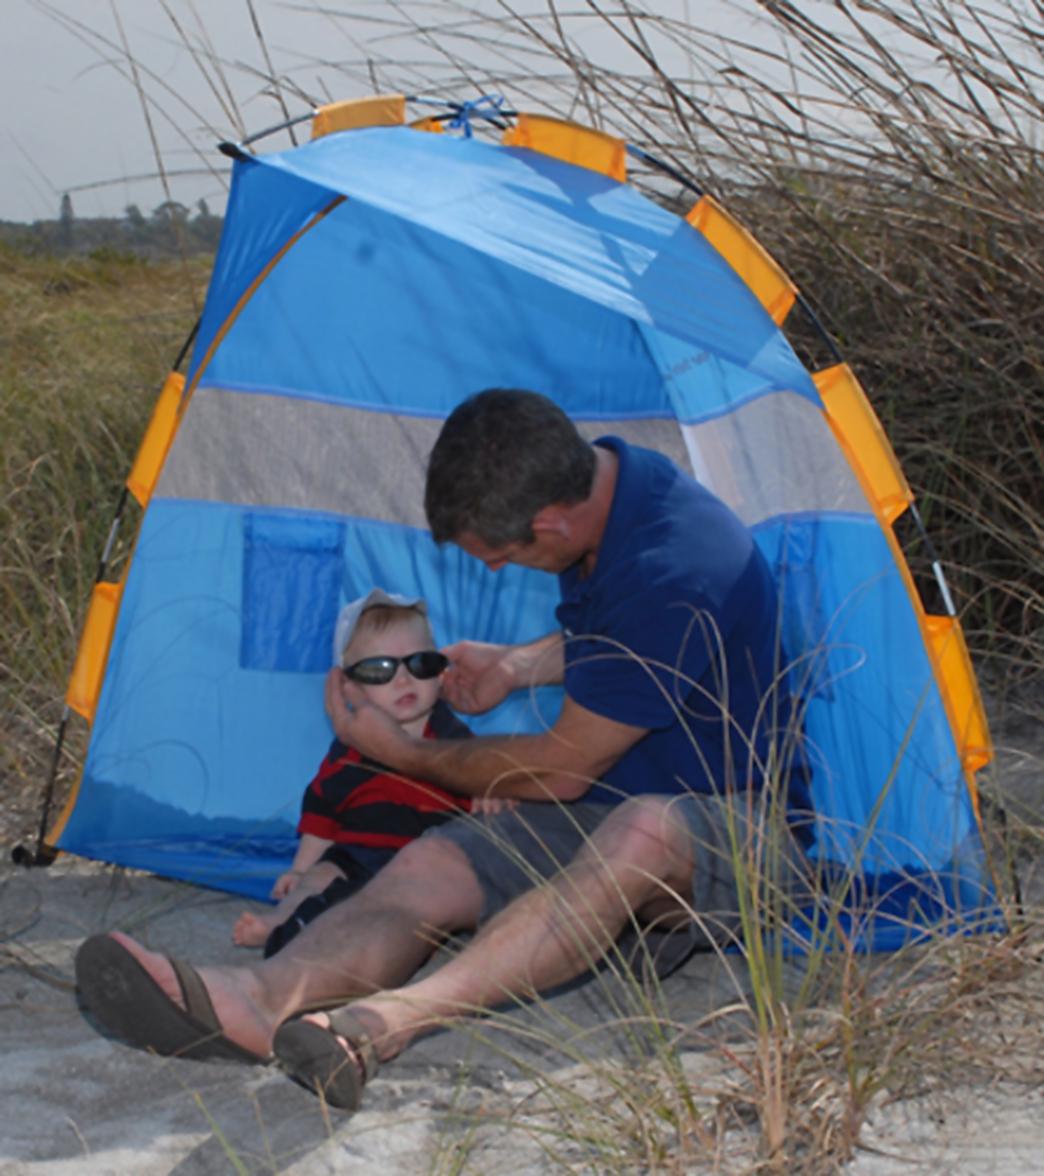 & Abo Gear Pocket Shelter Beach Shelter at SwimOutlet.com